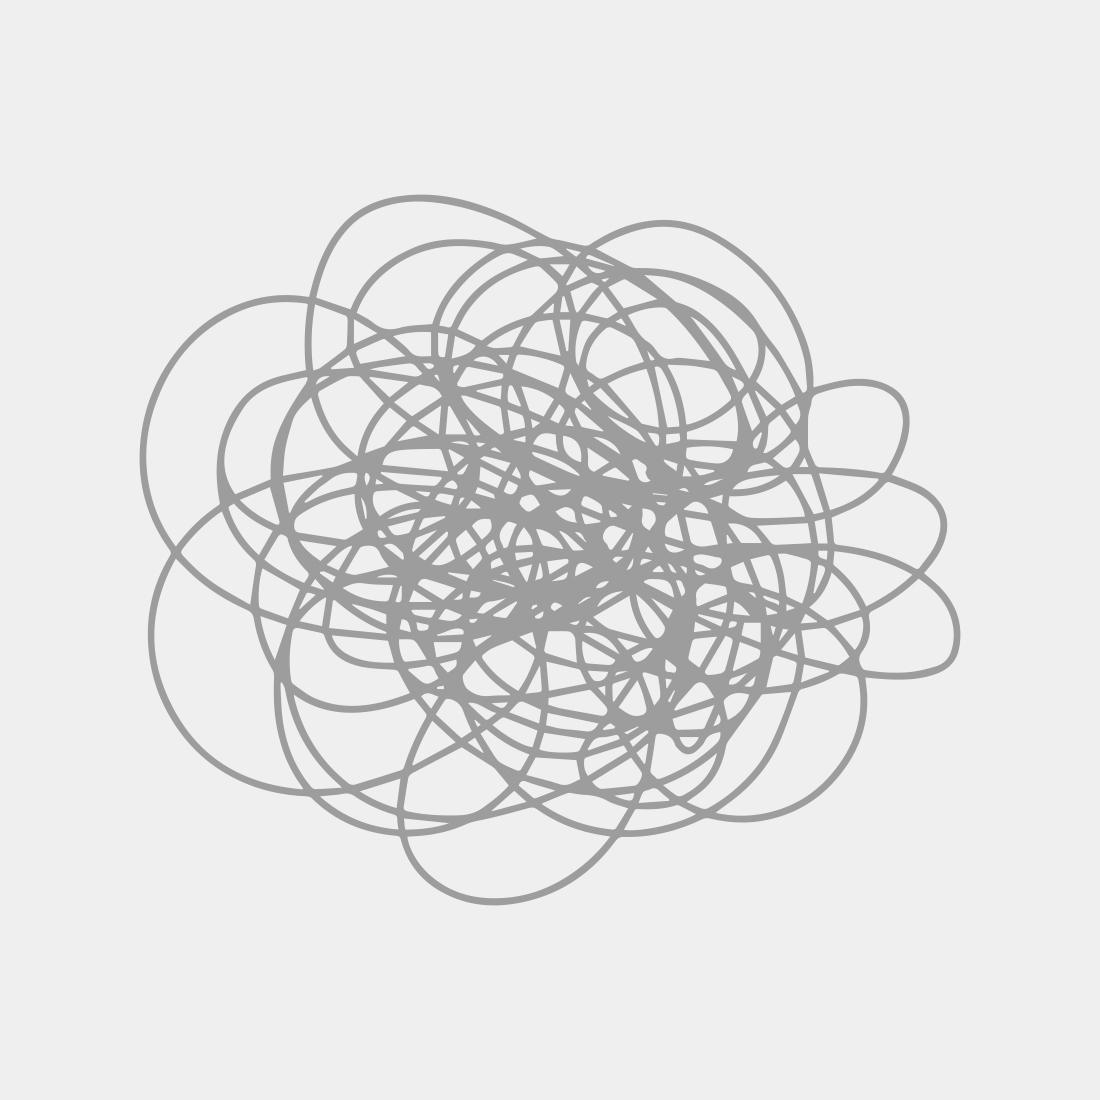 Sticker and Poster Street Art